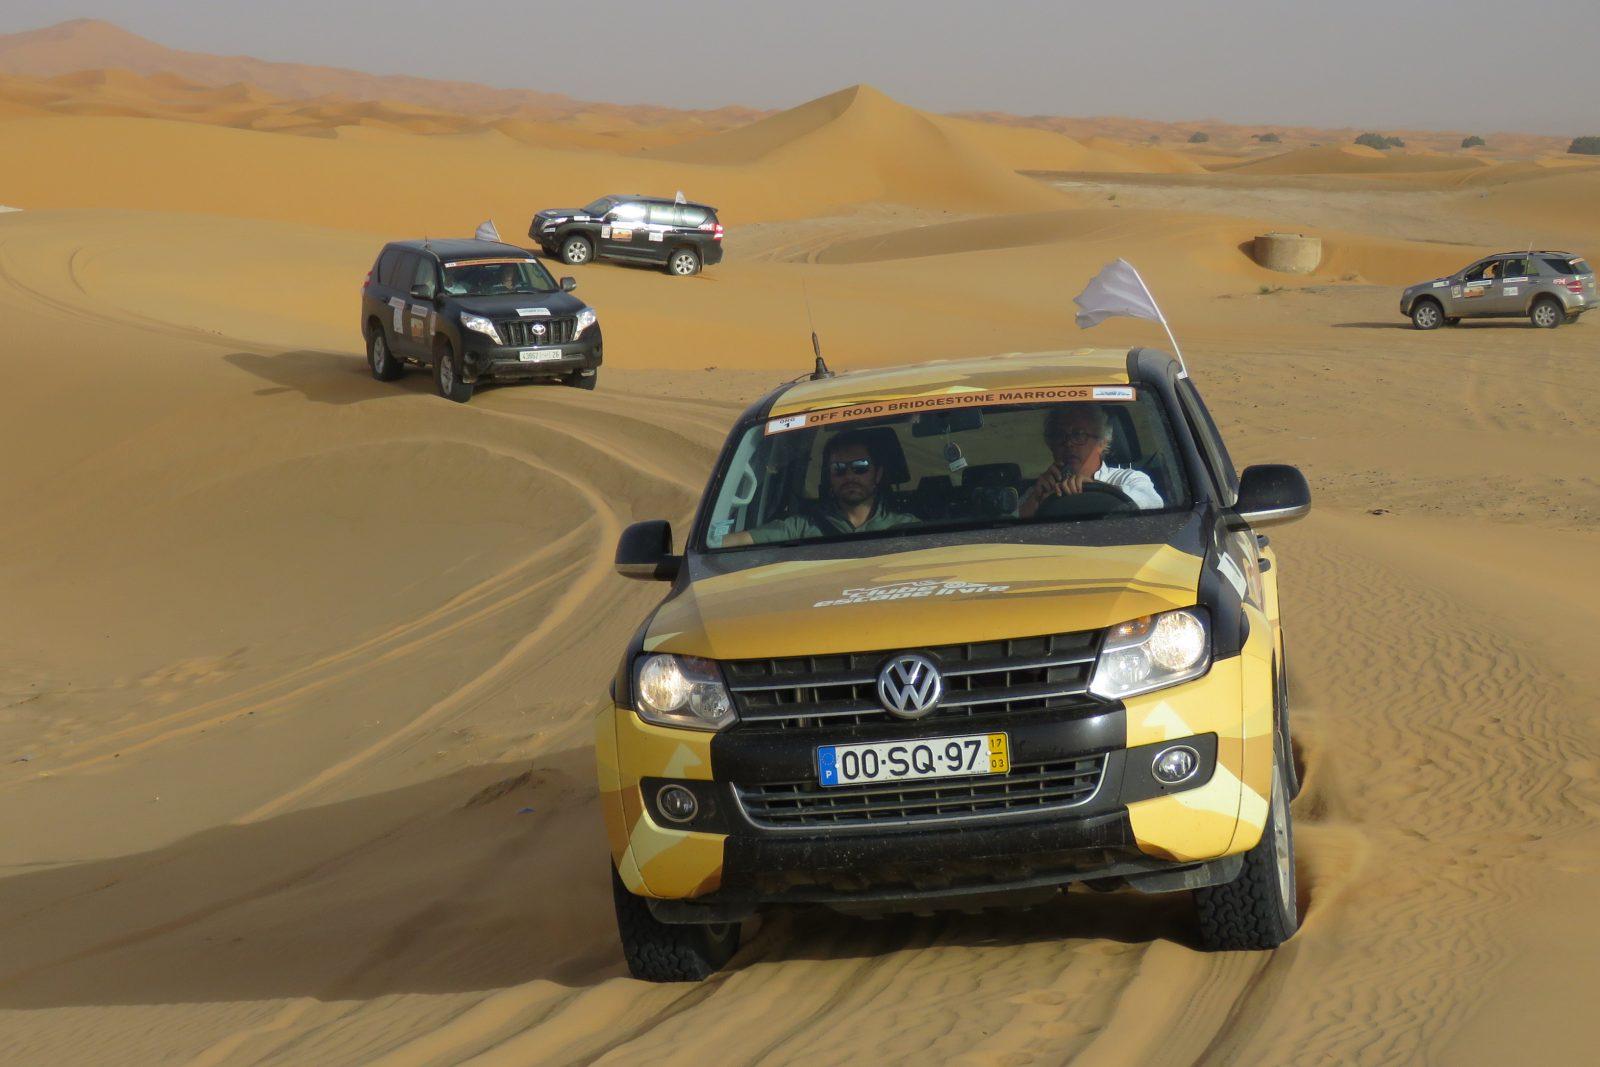 conduzir na areia marrocos